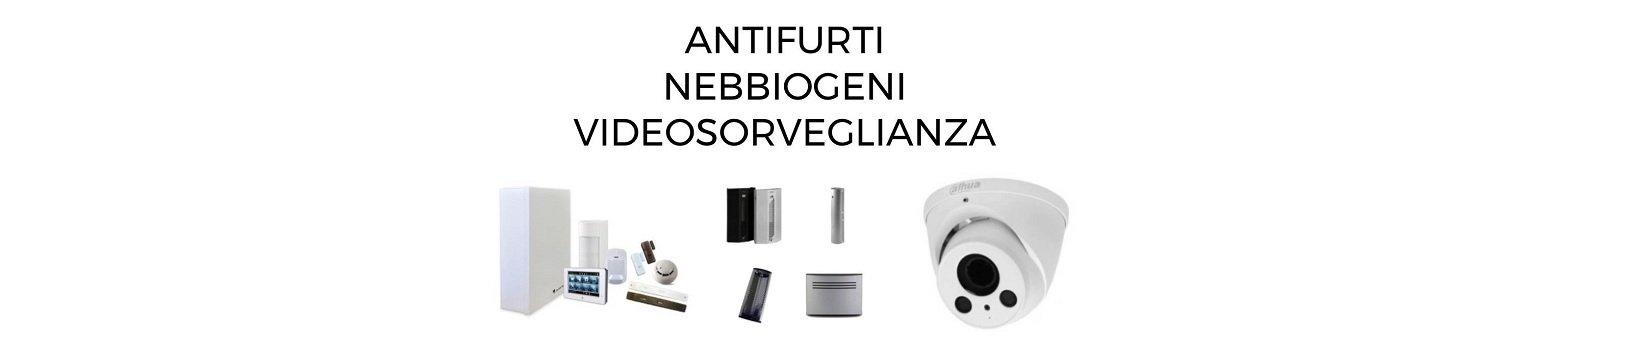 Jorio Antifurti-Nebbiogeni-Videosorveglianza